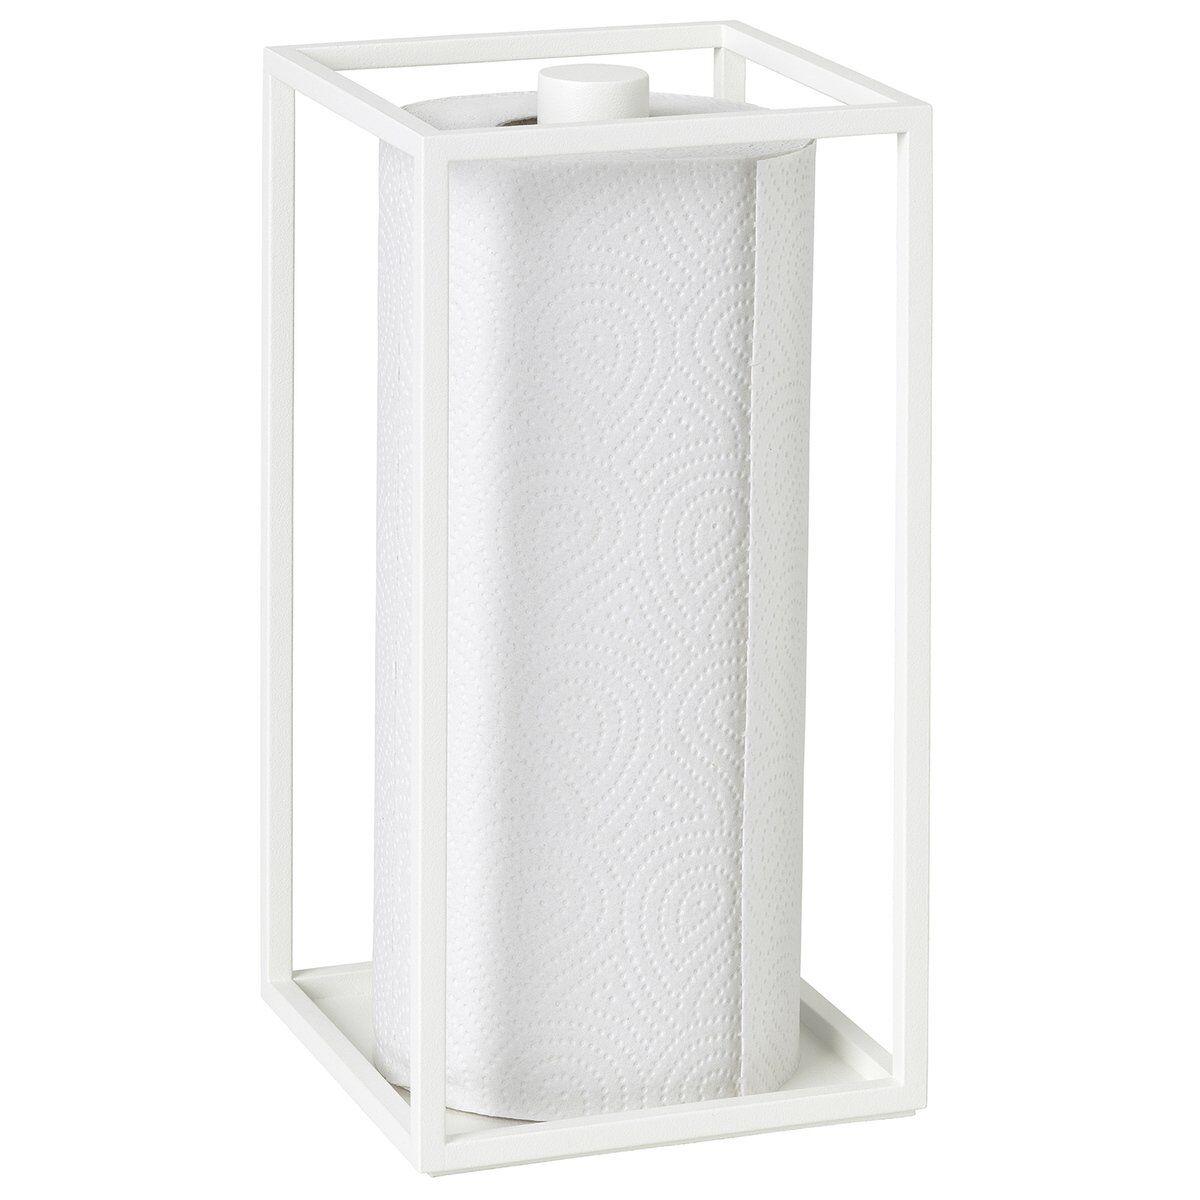 By Lassen Kubus Roll'in kitchen paper holder, white